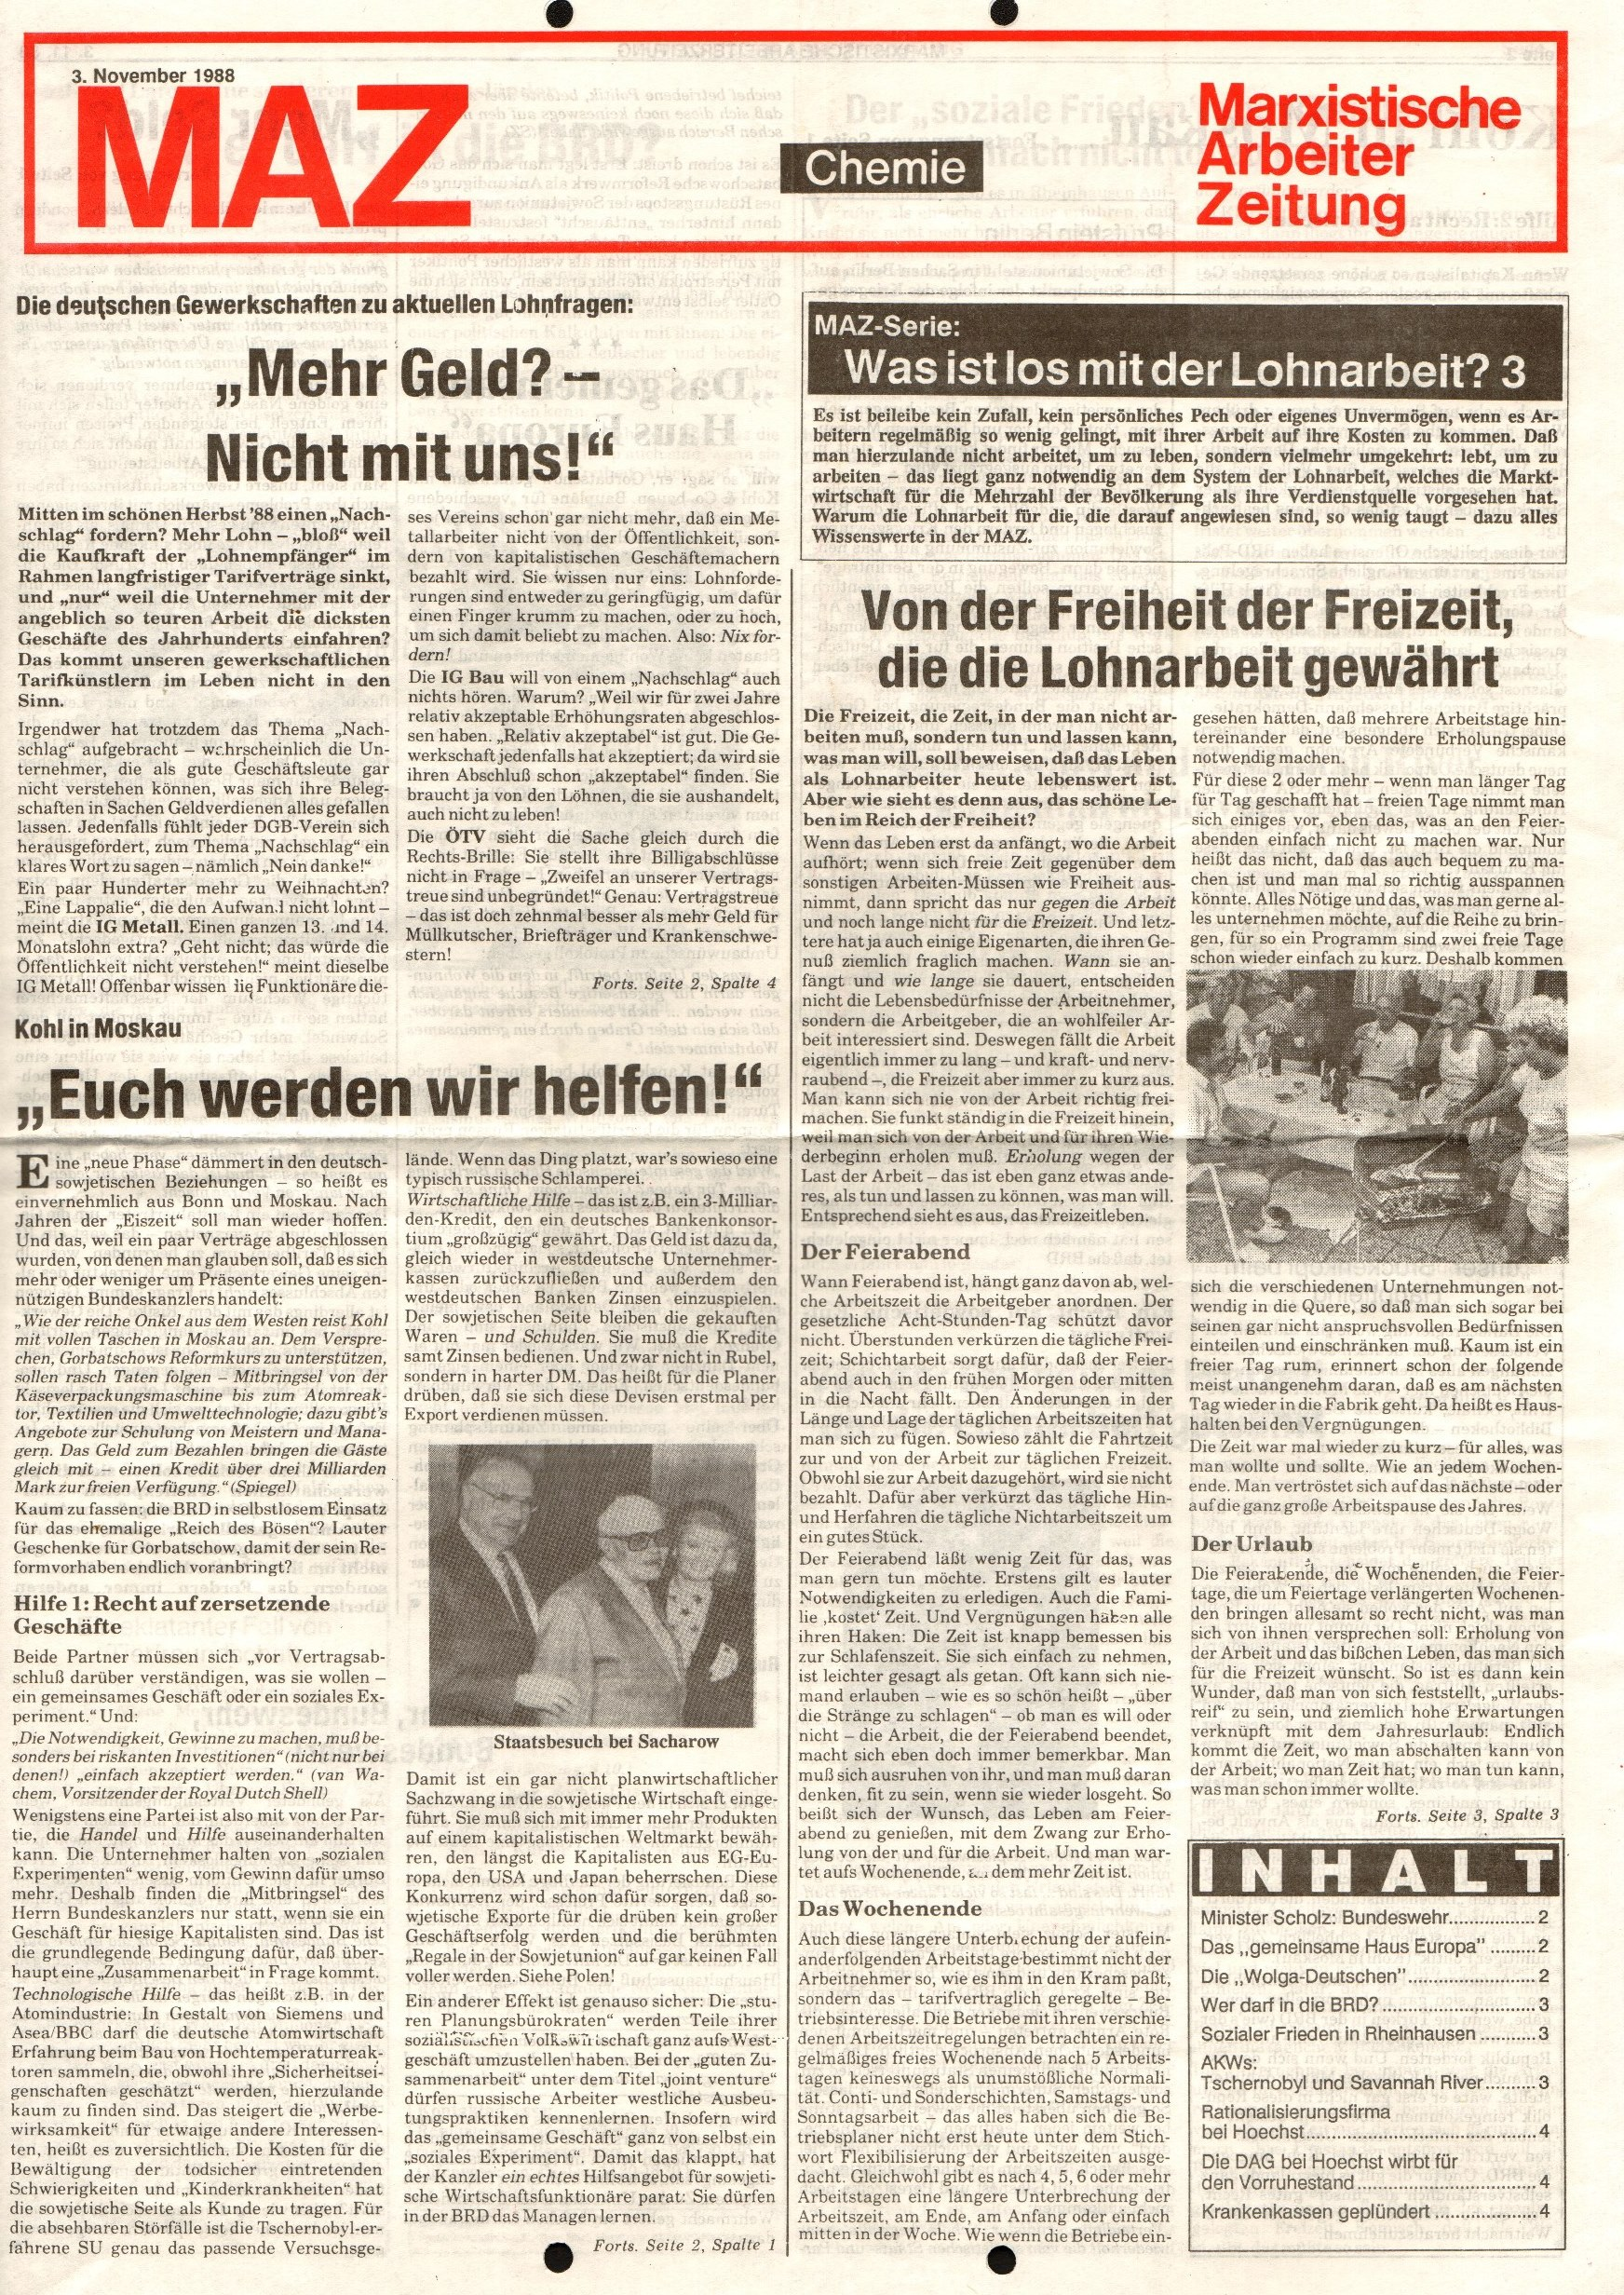 Frankfurt_CPK_Hoechst_MAZ505